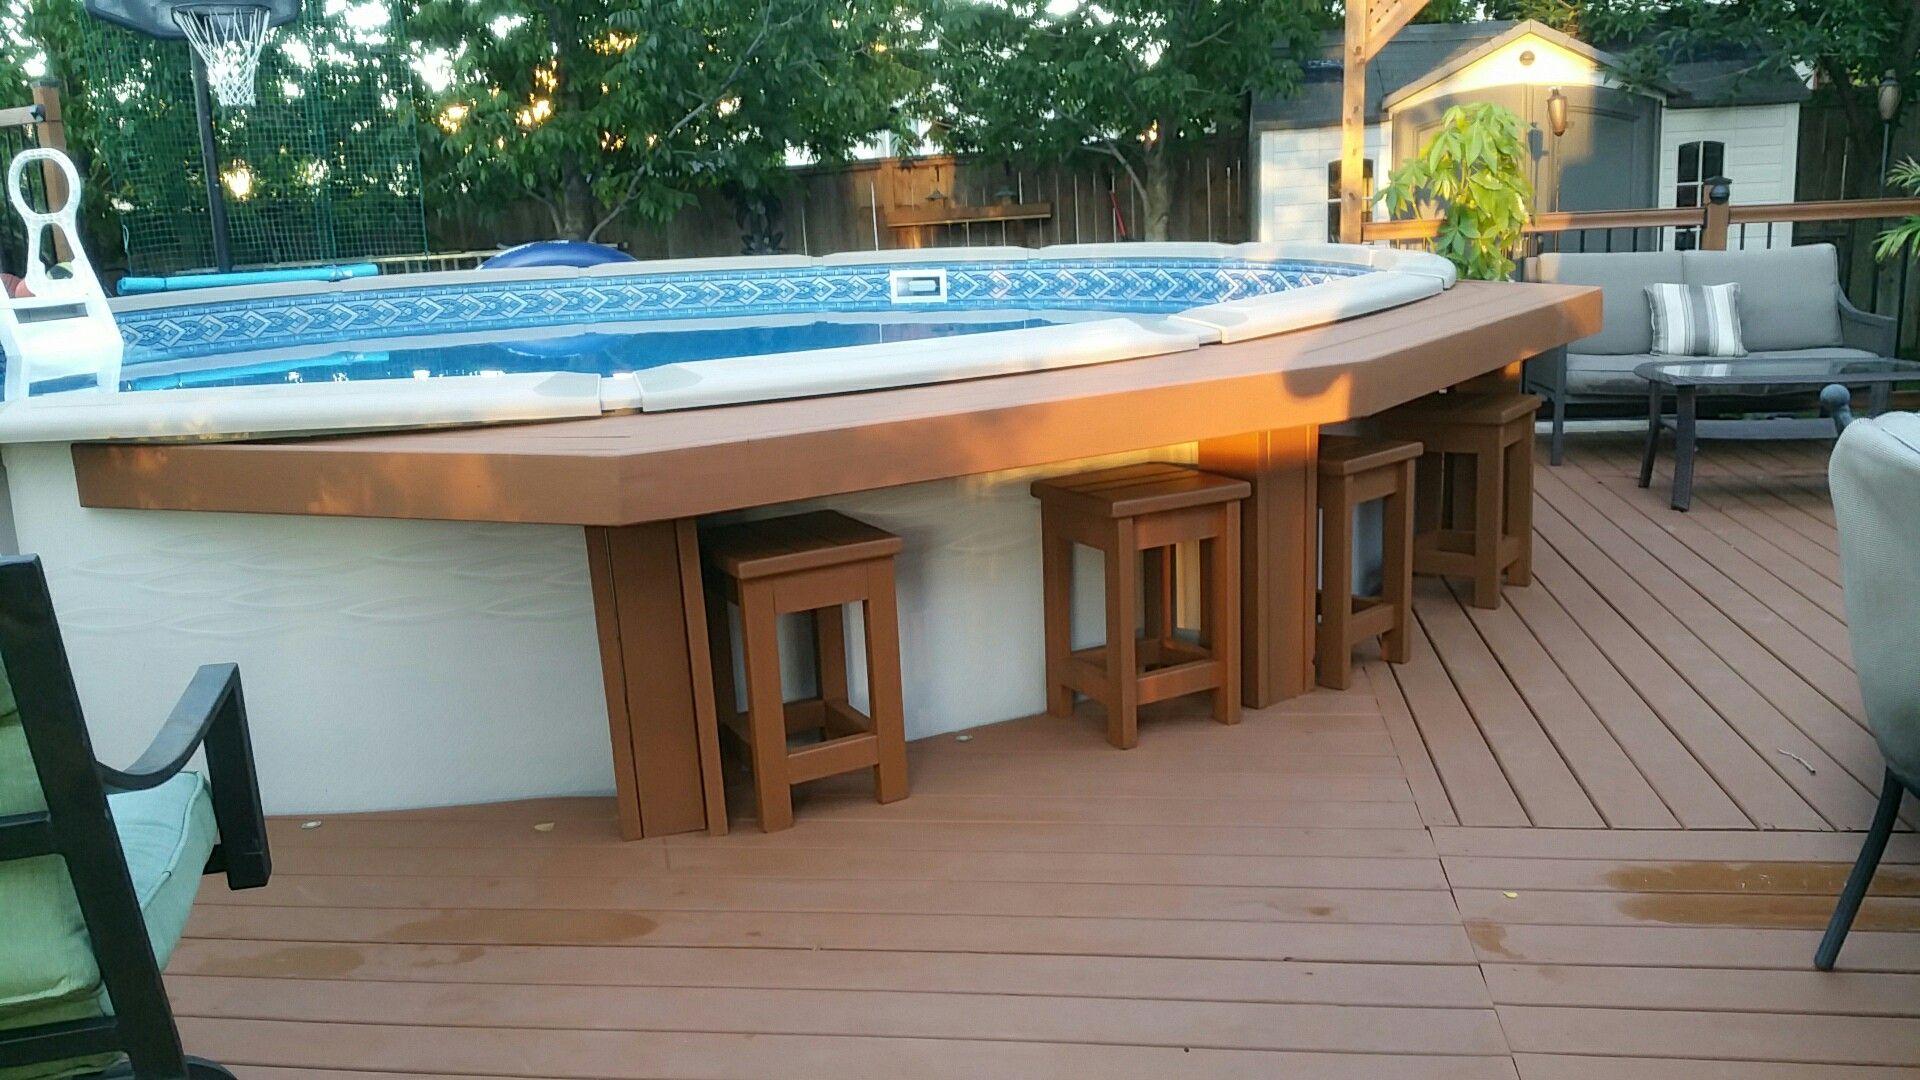 Pool Bar Swimming Pool Decks Above Ground Pool Decks Backyard Pool Landscaping Diy backyard swim up bar